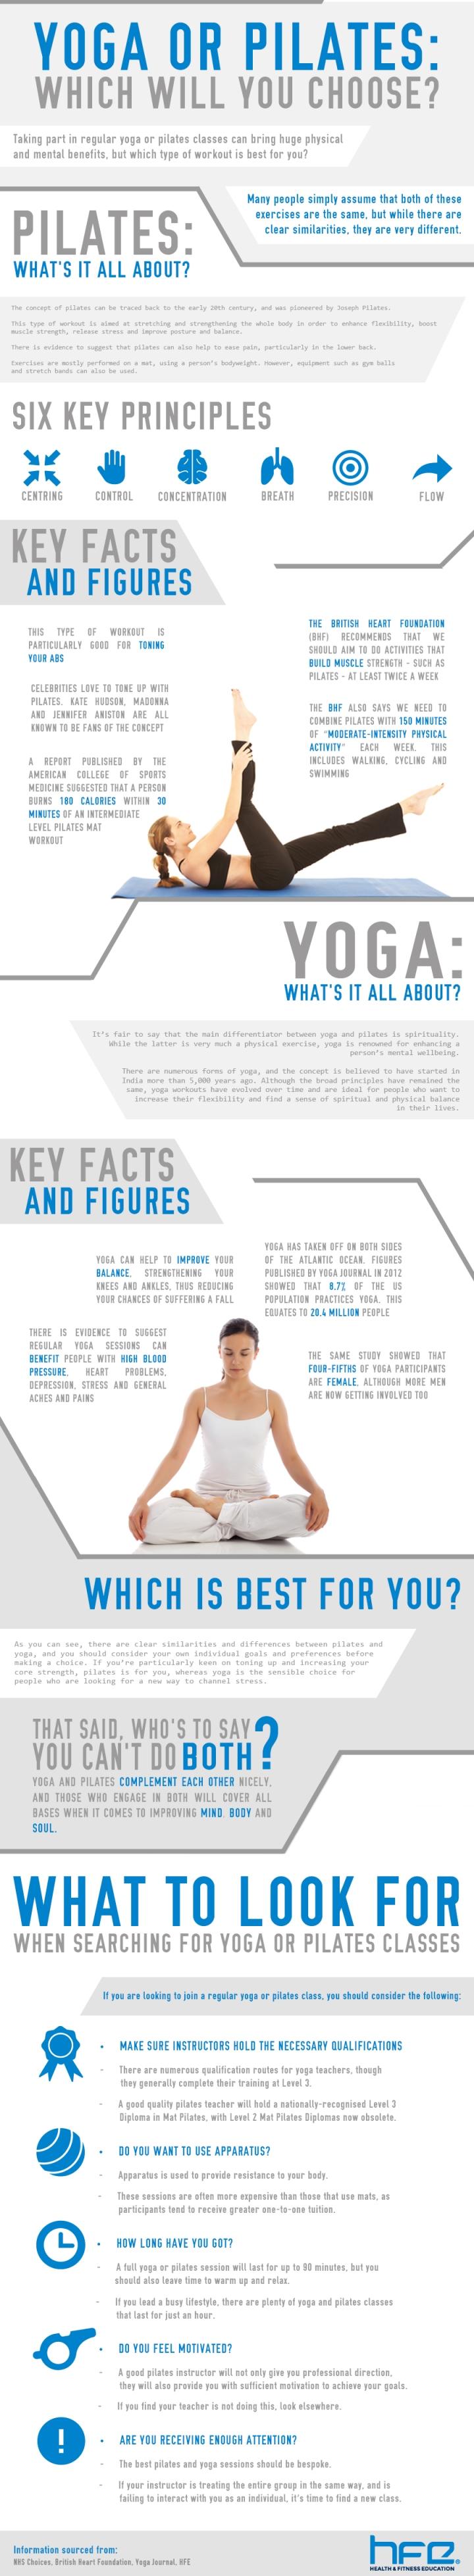 yoga or pilates infographic